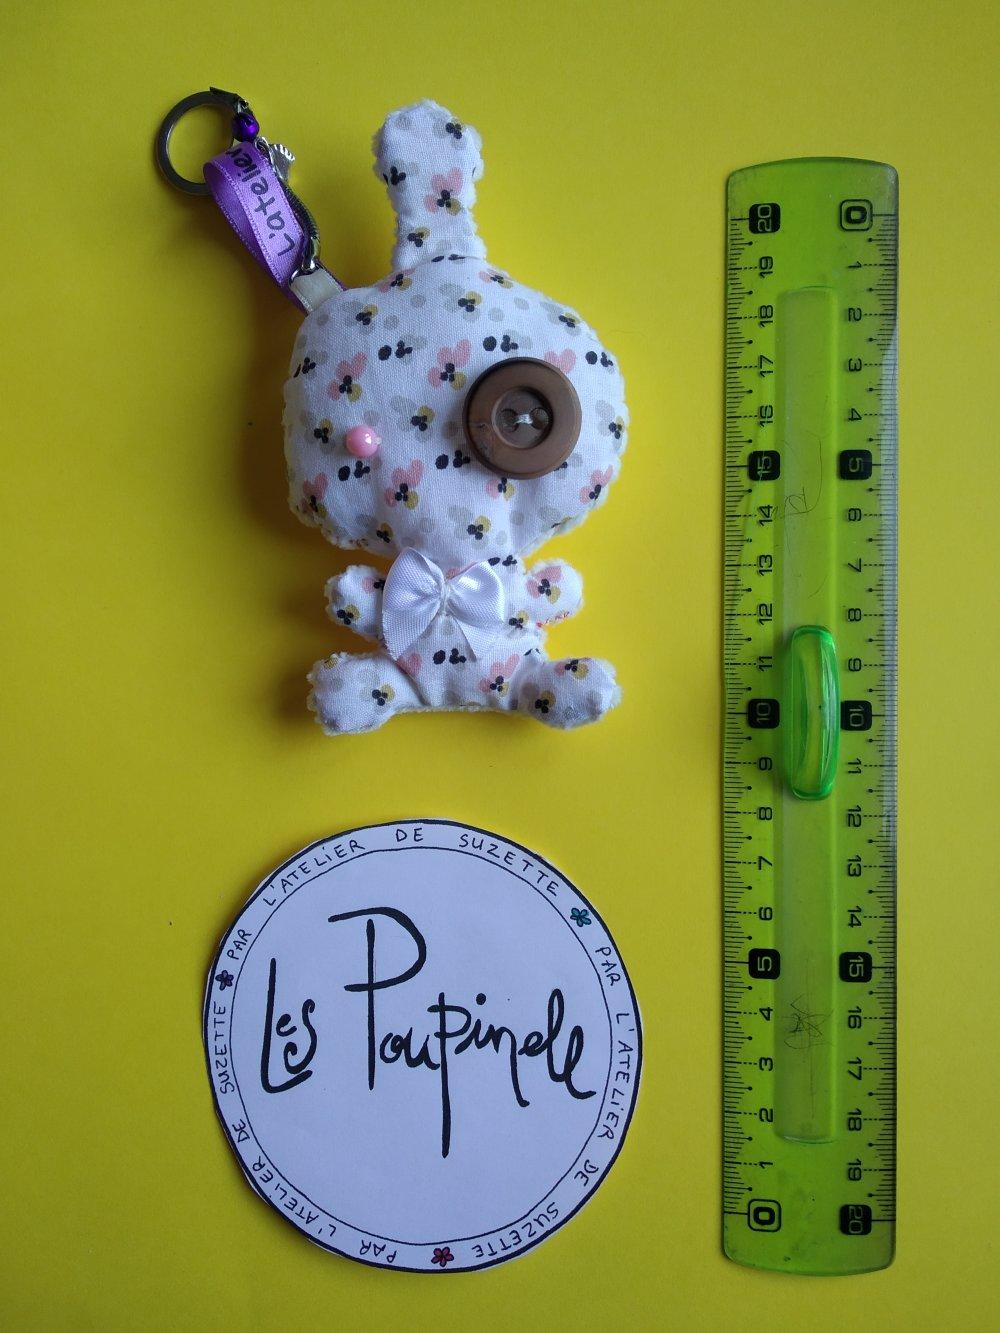 PORTE CLEF POUPINELL